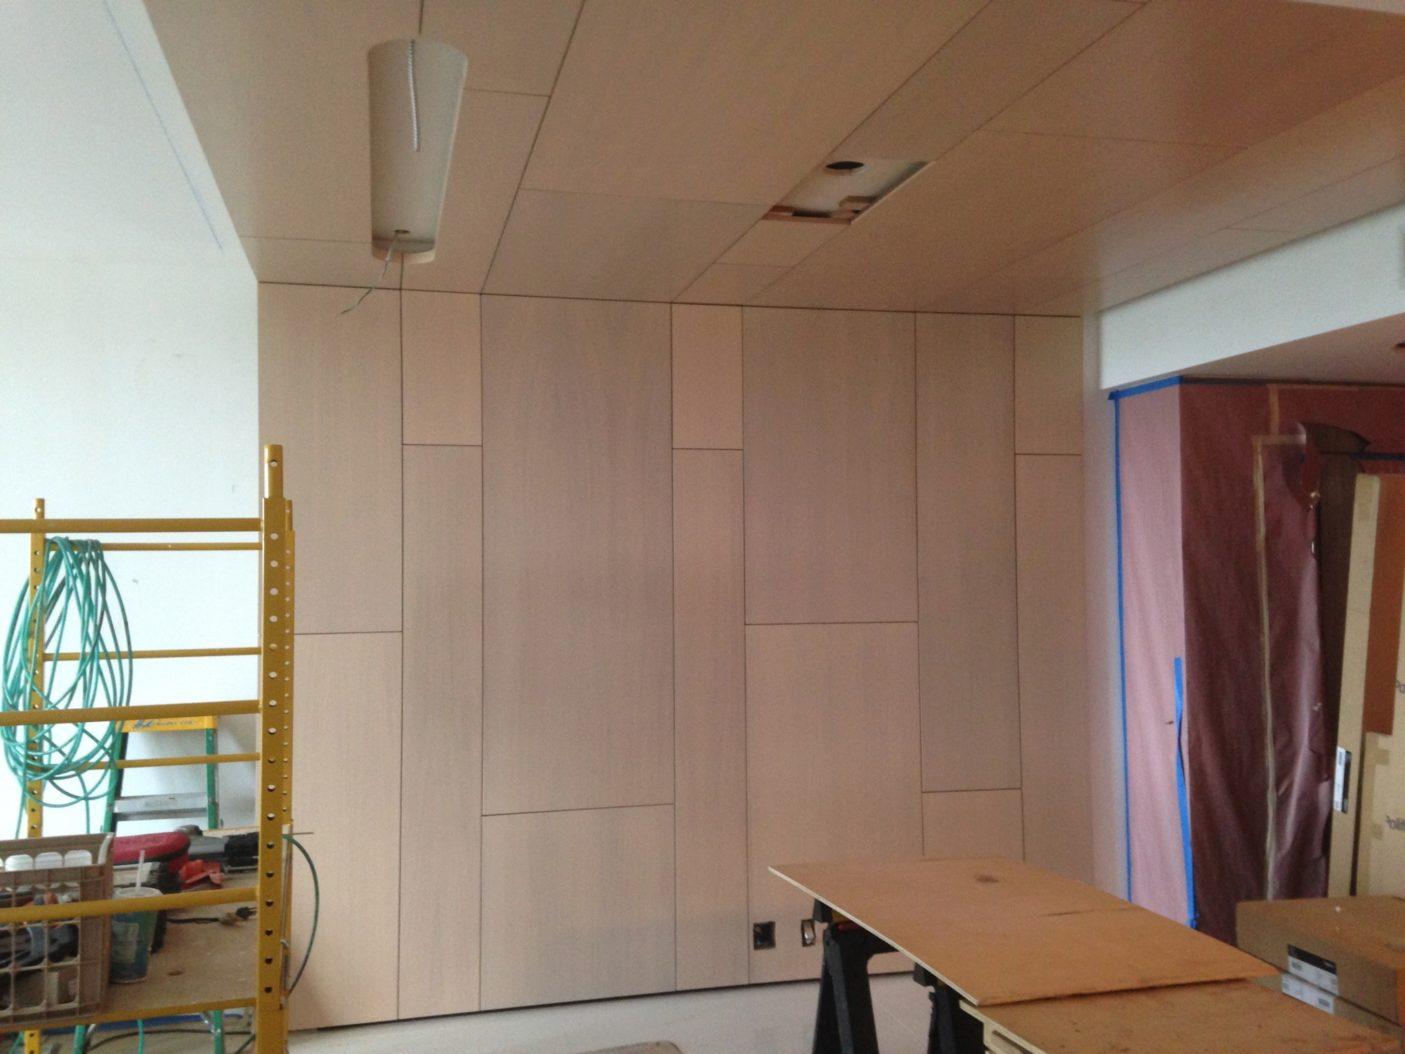 Panels-And-Doors-55.jpg